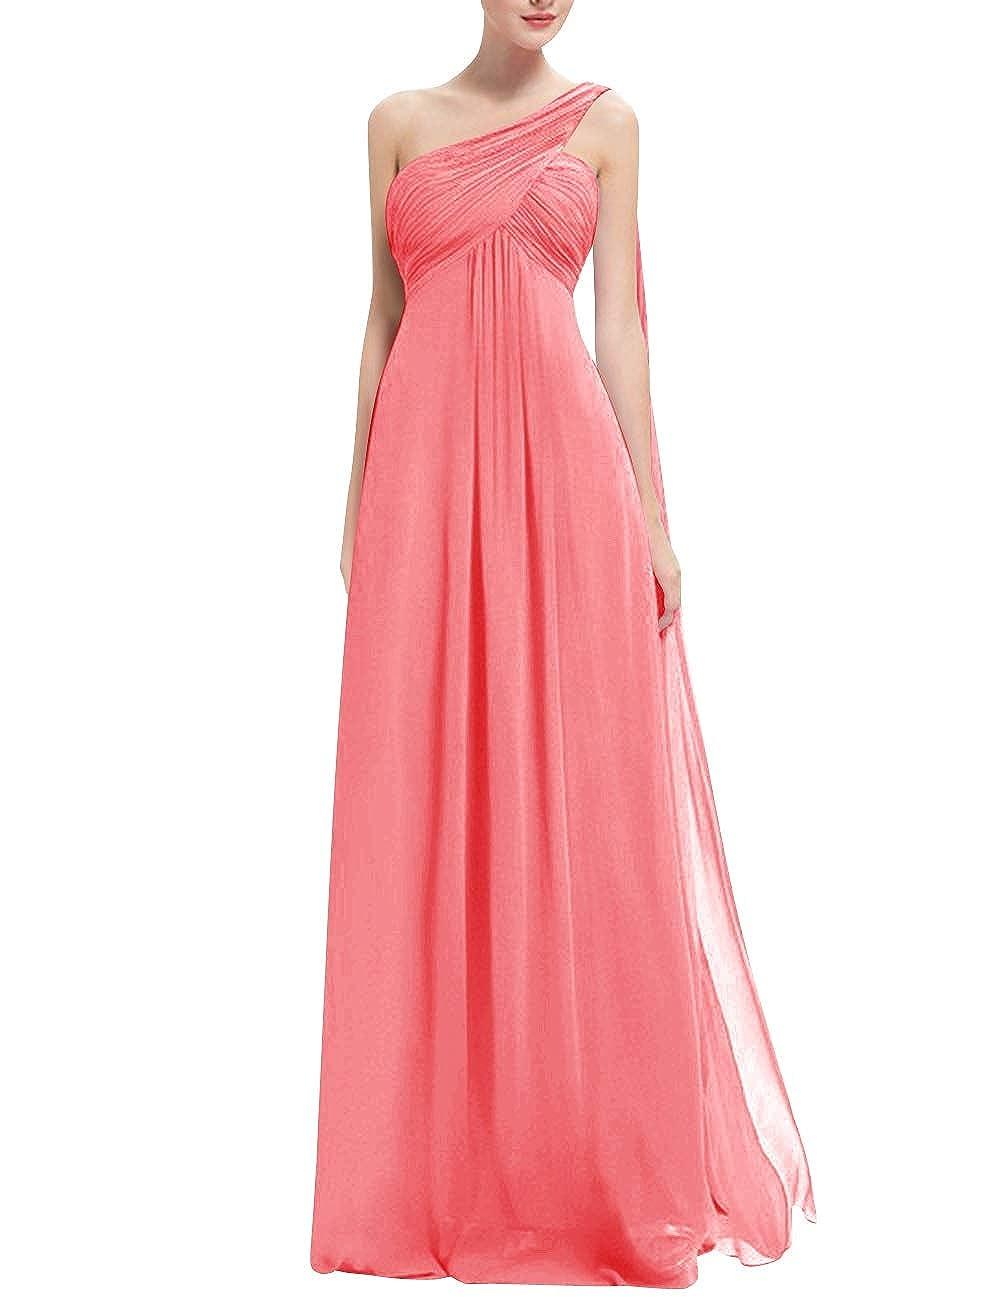 Bess Bridal Womens One Shoulder High Waist Watteau Train Prom Bridesmaid Dress